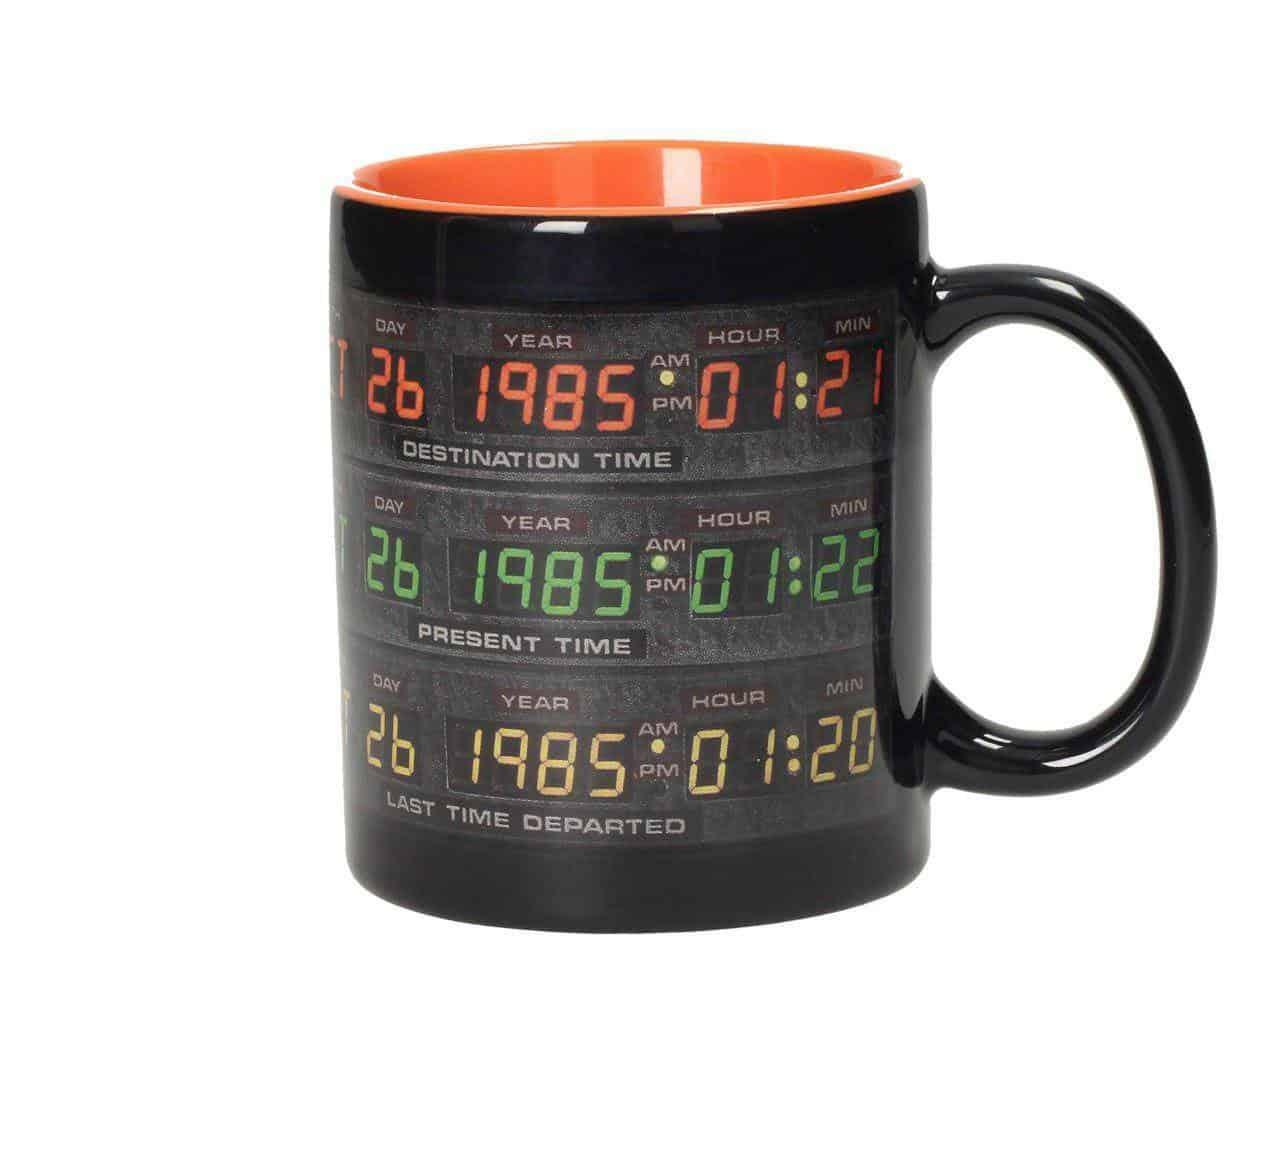 Back to the Future Mug Control Panel